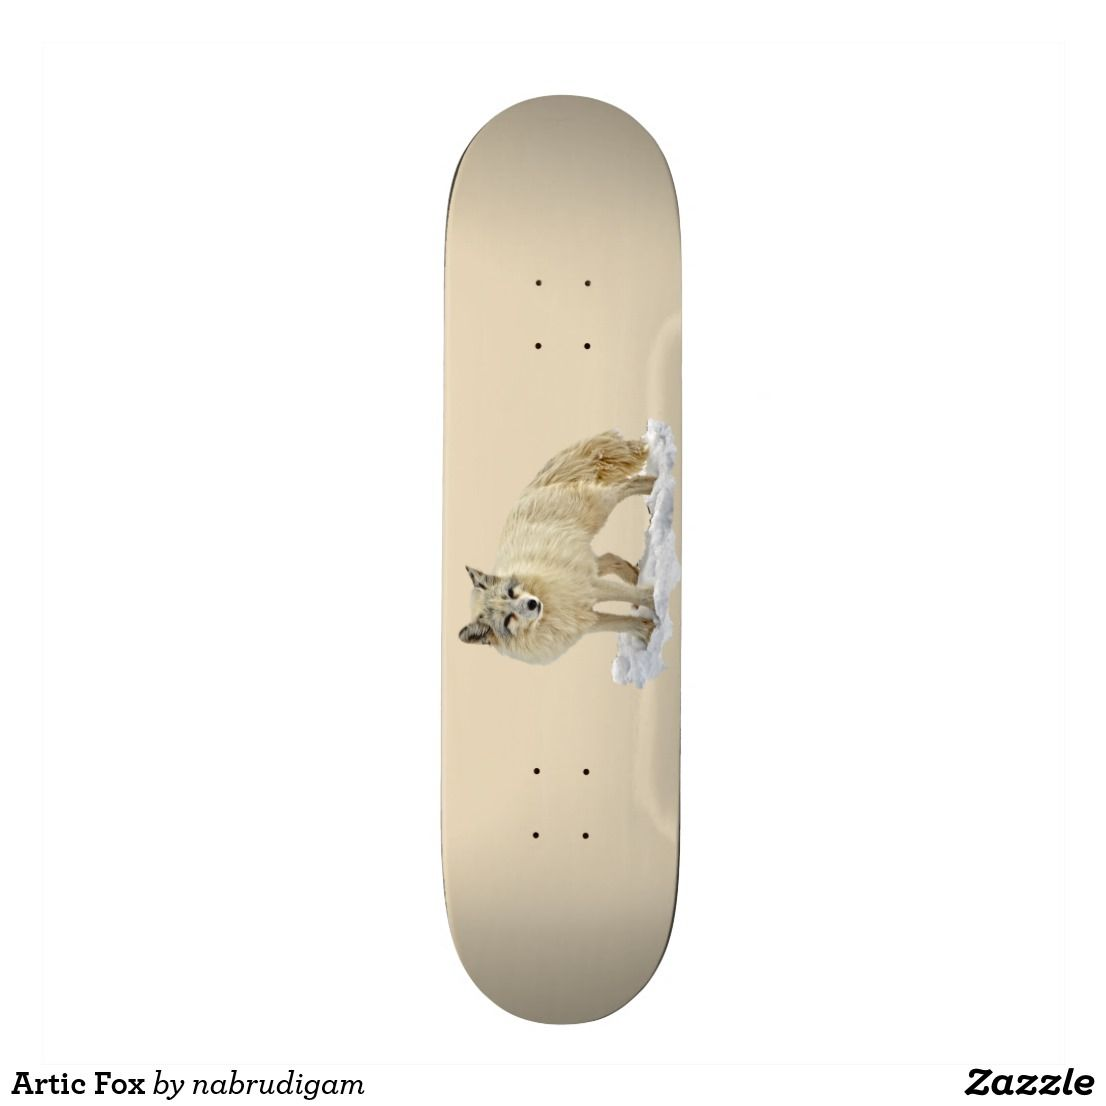 Artic Fox Skateboard Zazzle Com Skateboard Cool Skateboards Hard Rock